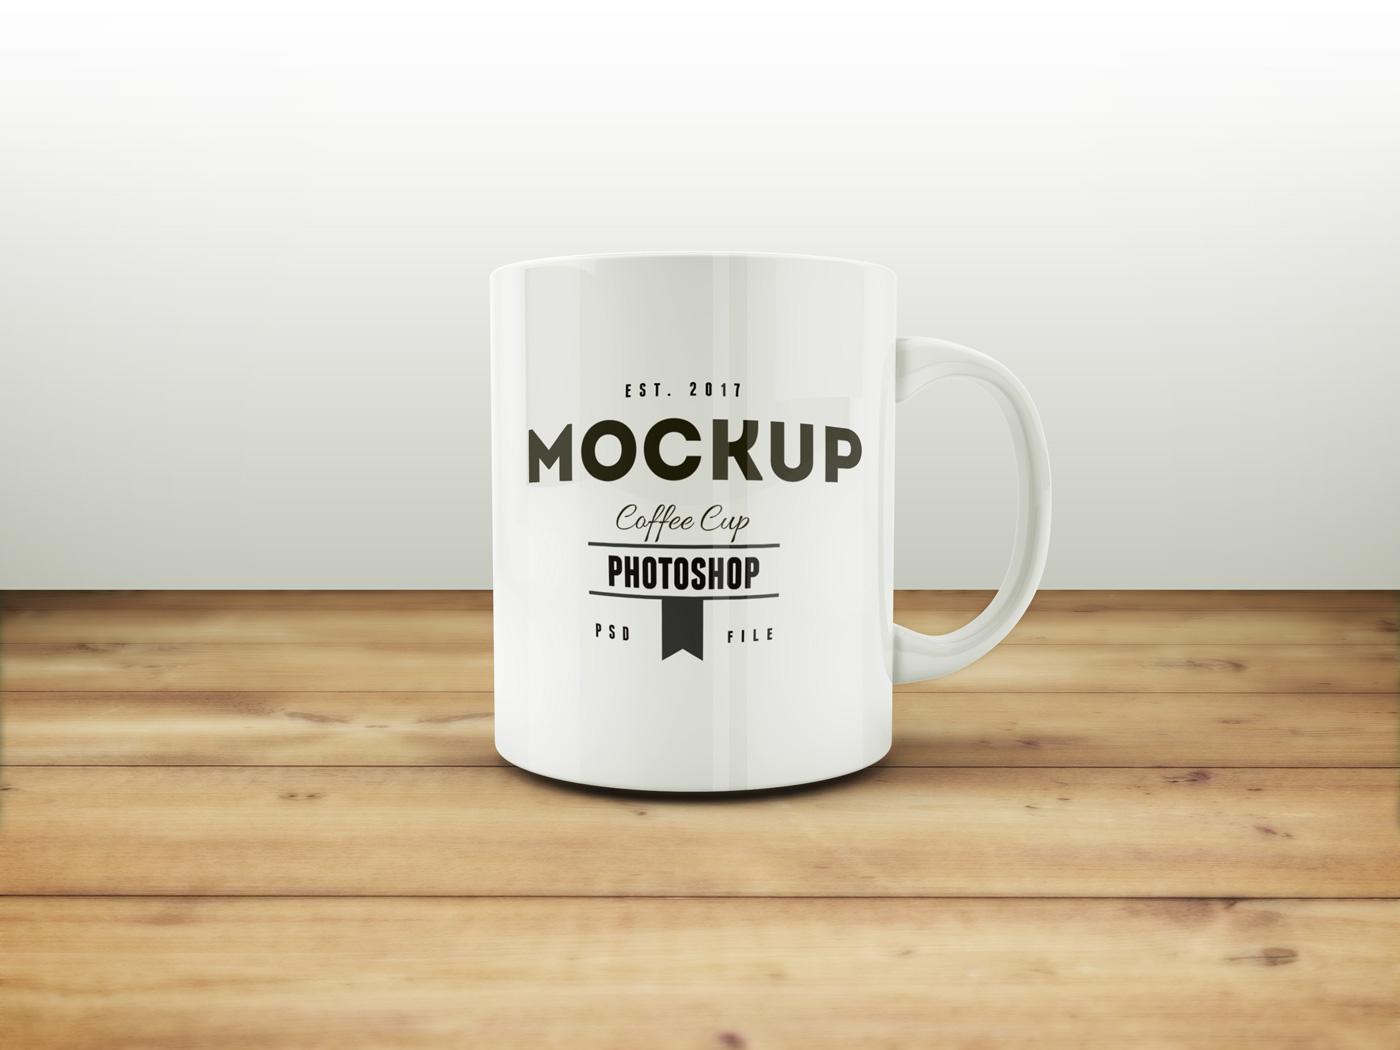 ... mug mockup template you can do many things using this free coffee mug